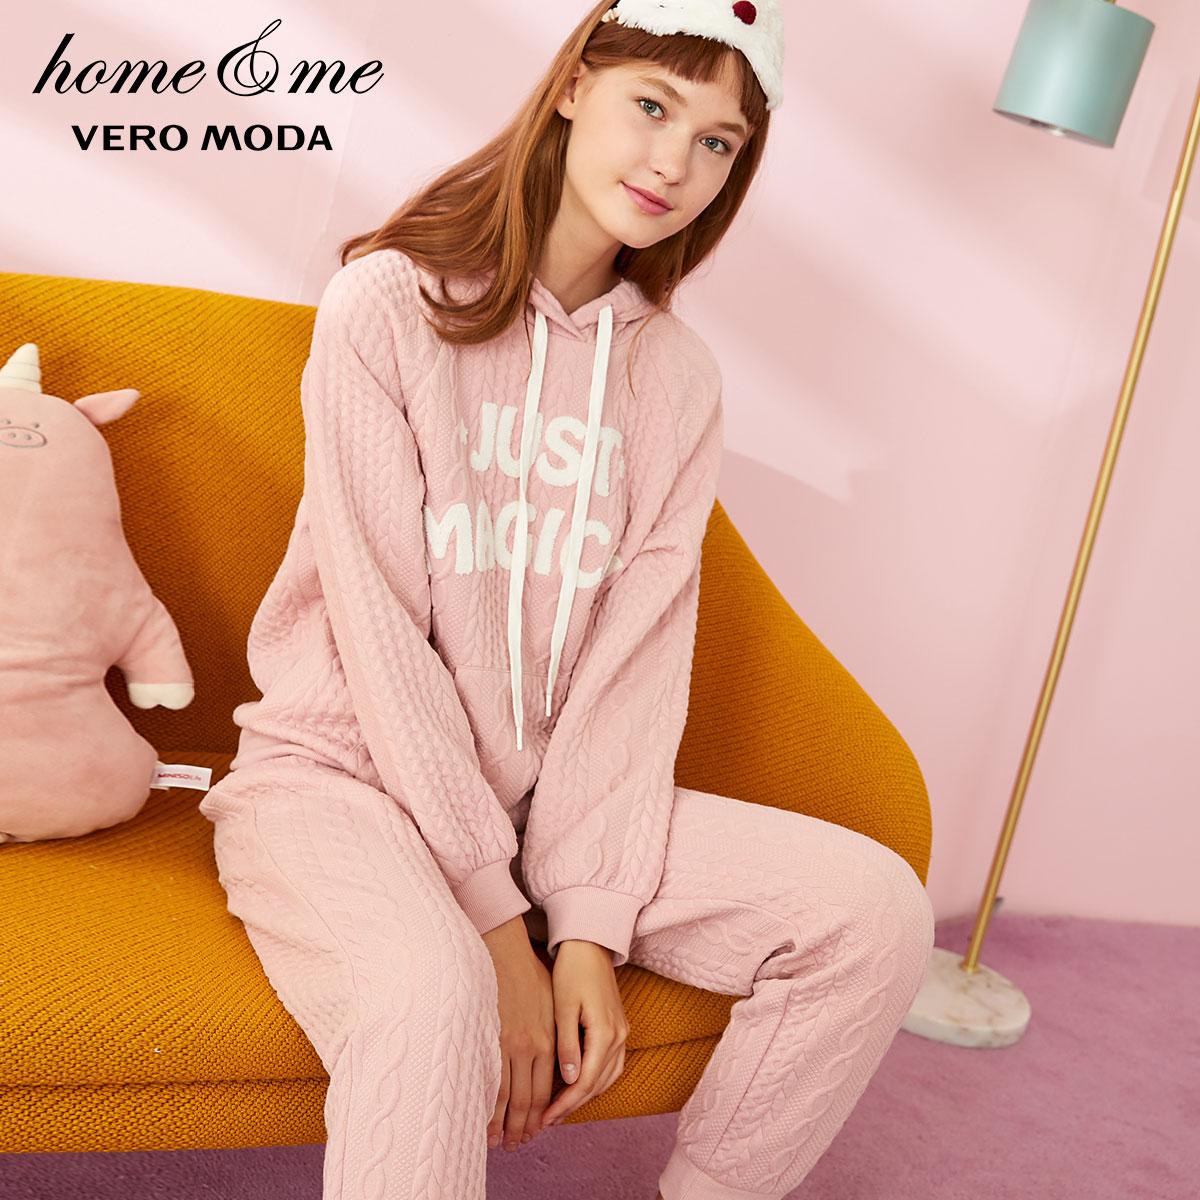 Vero Moda Women's Twist Plaid Letters Hooded Top & Pants Lounge Wear Pajamas Sets | 31948L502